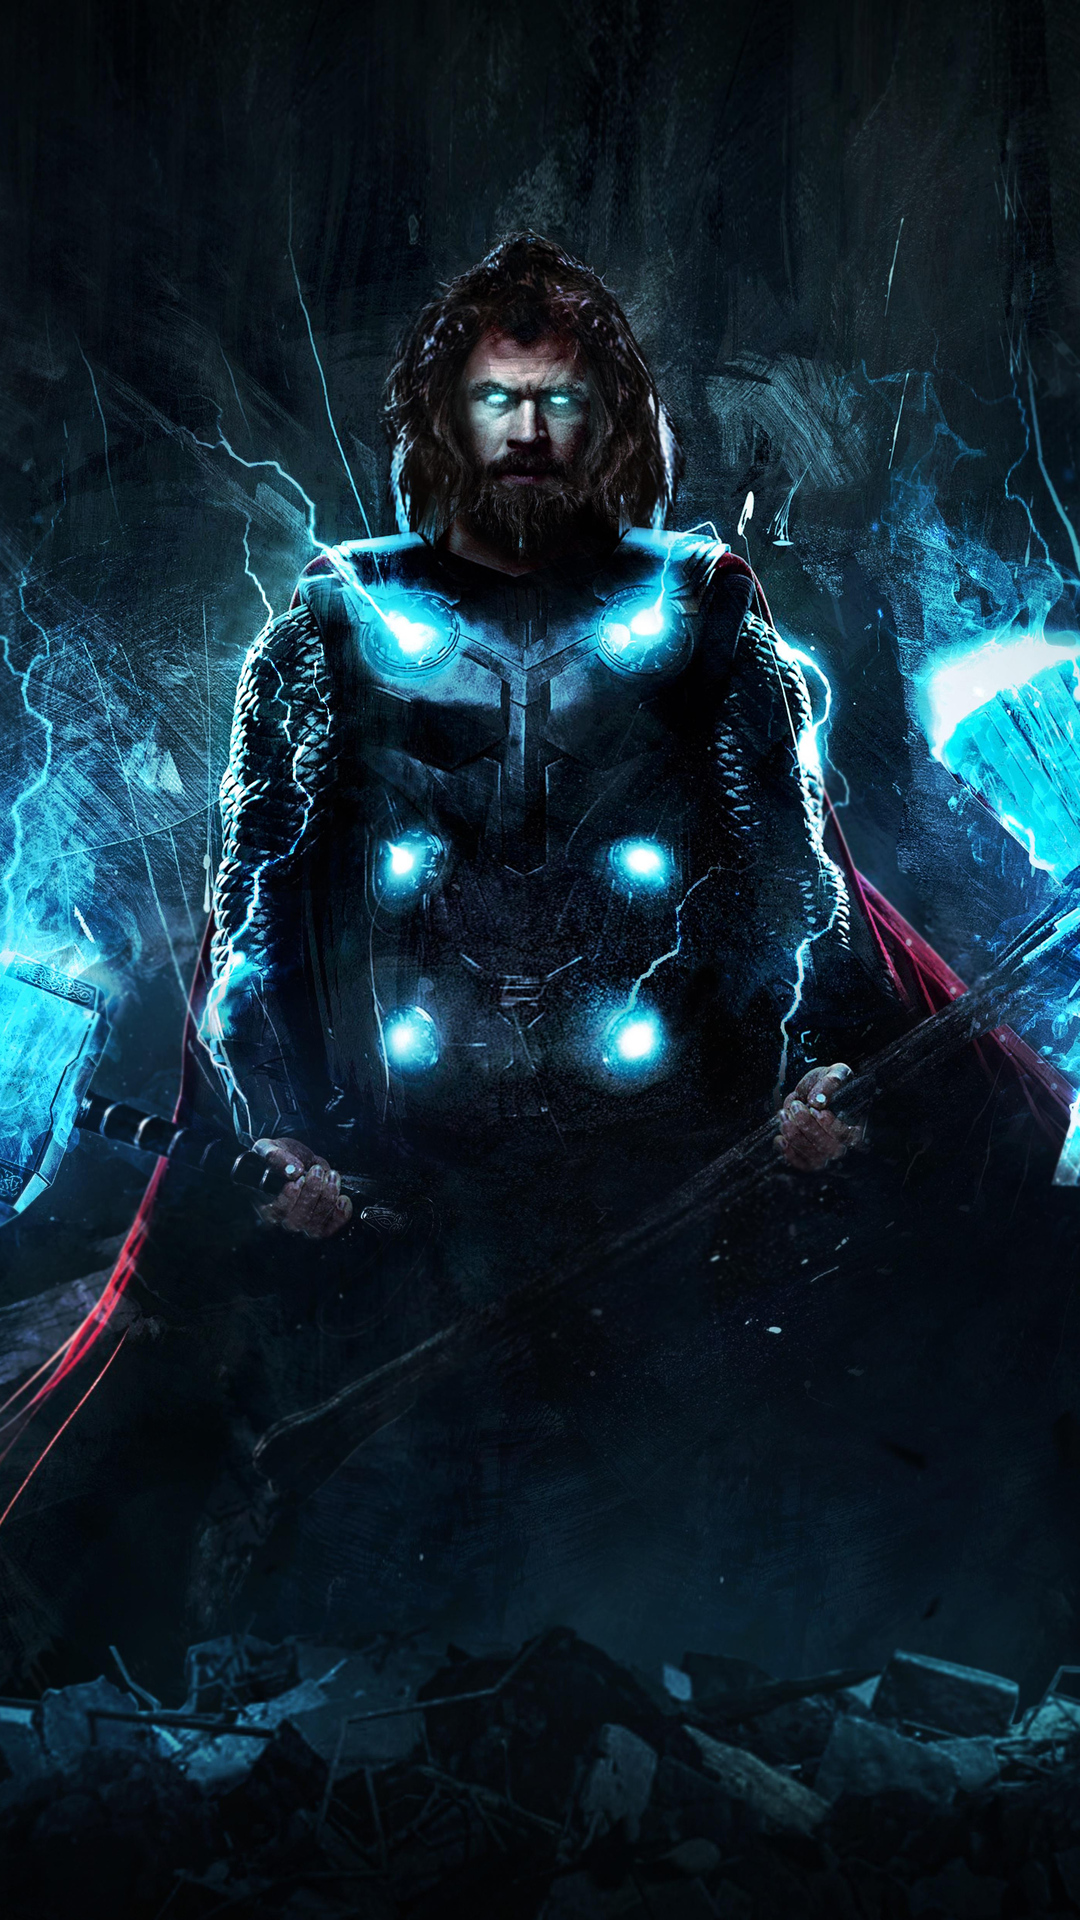 1080x1920 4k Thor In Avengers Endgame Iphone 7 6s 6 Plus